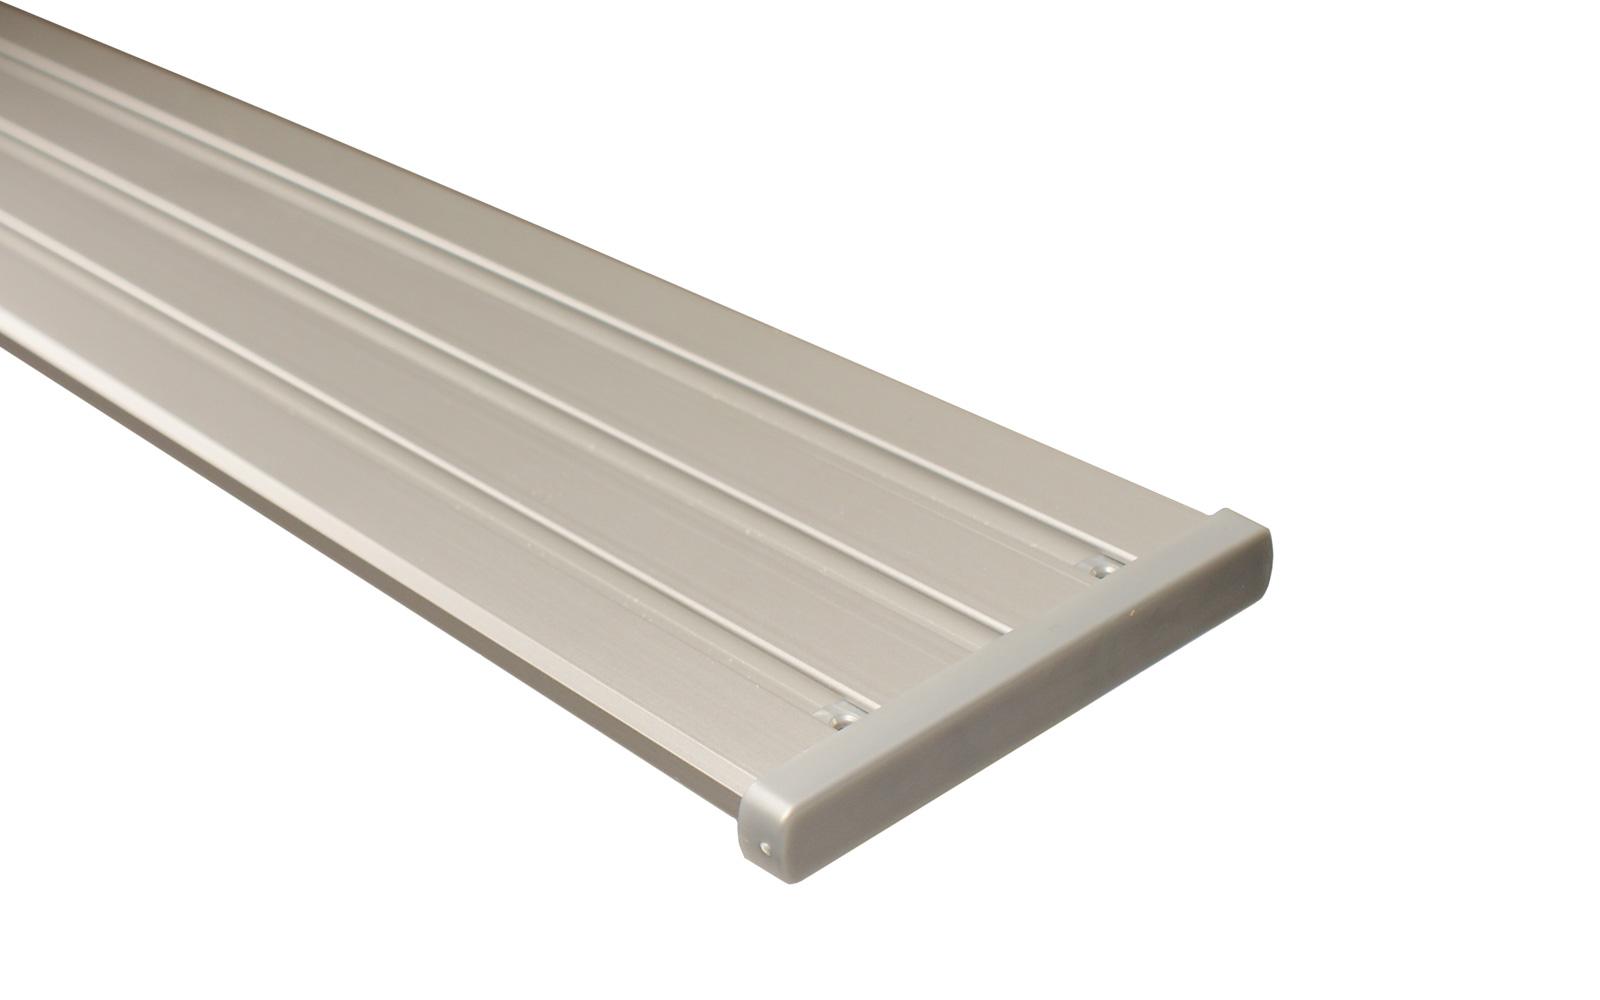 4 l ufige vorhangschiene aus aluminium silber. Black Bedroom Furniture Sets. Home Design Ideas